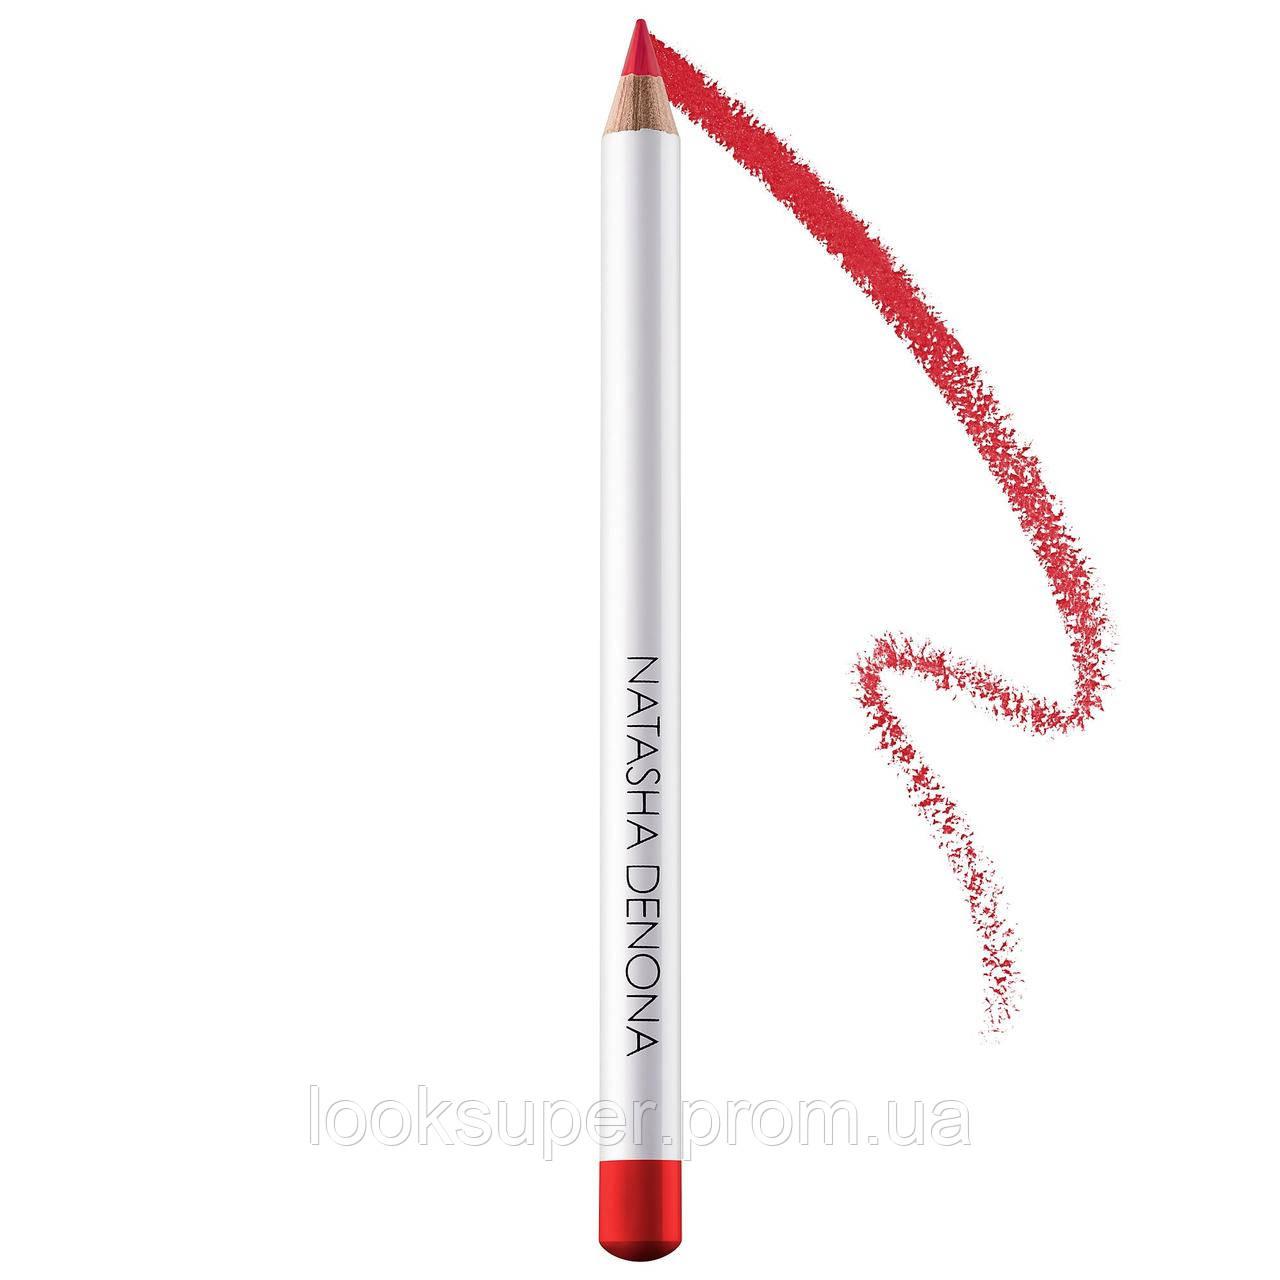 Карандаш для губ  NATASHA DENONA  Lip Liner Pencil  L16 cherry